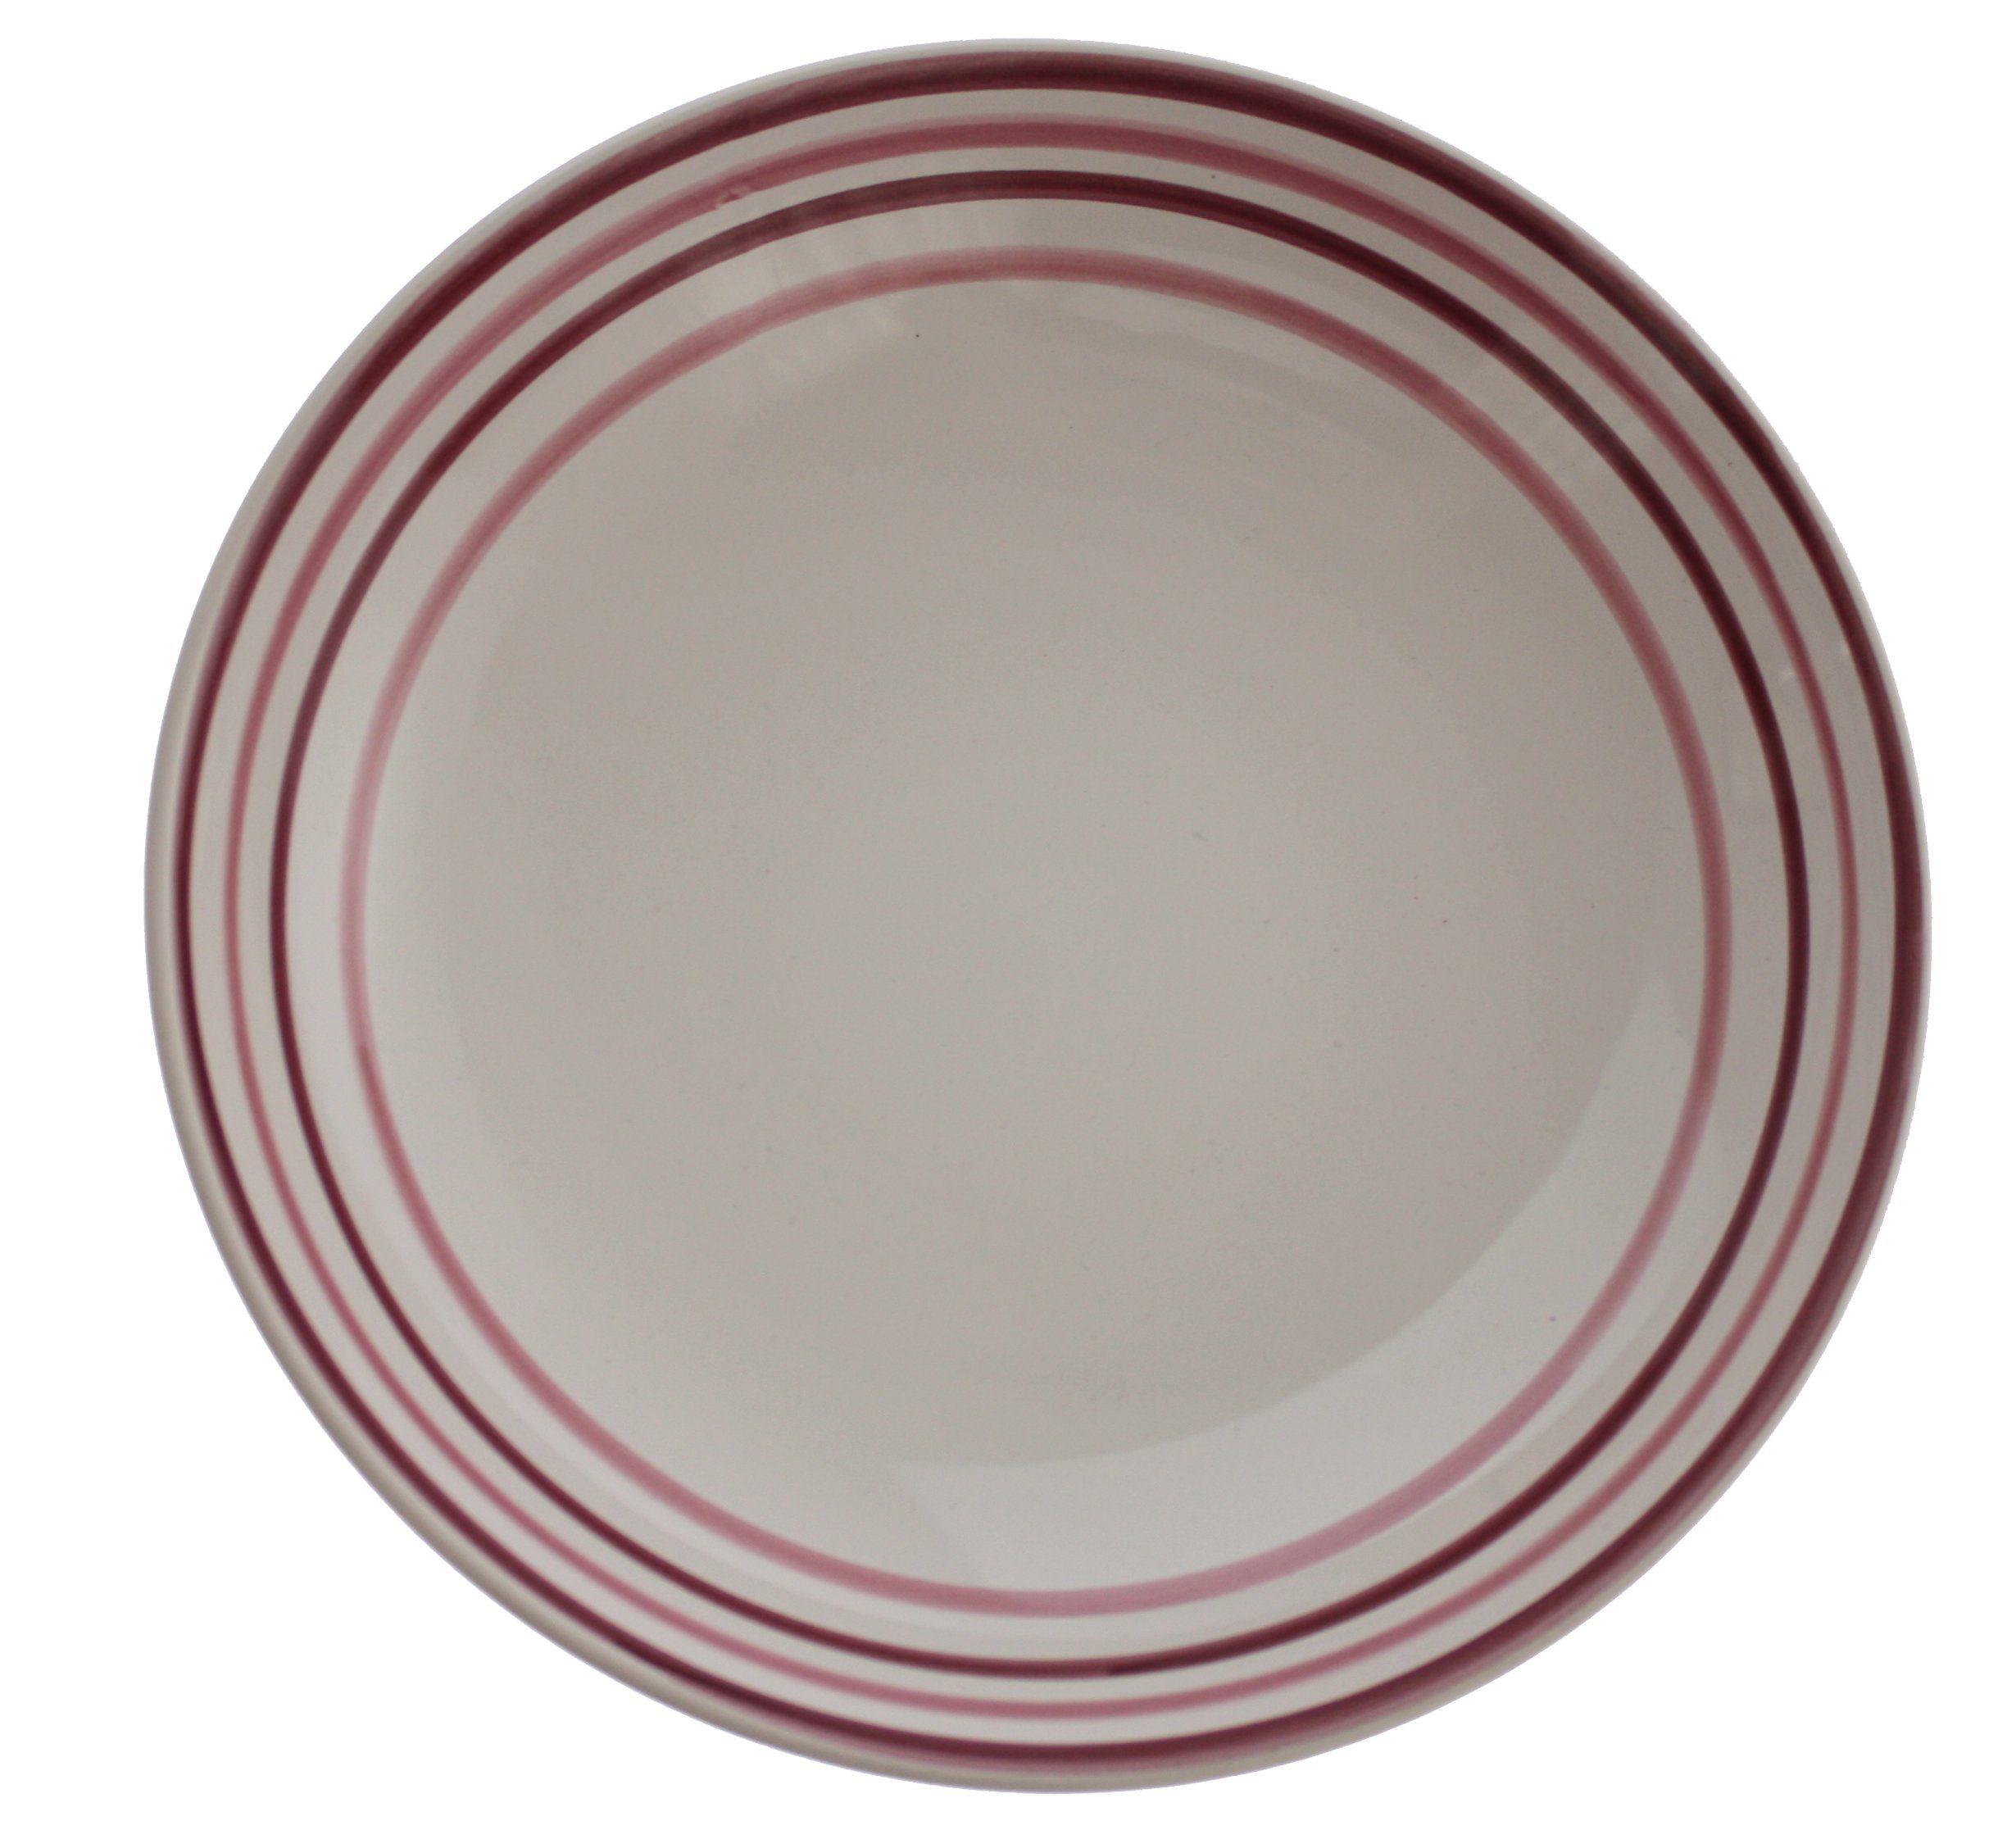 Zeller Keramik Teller tief »Ono Cara«